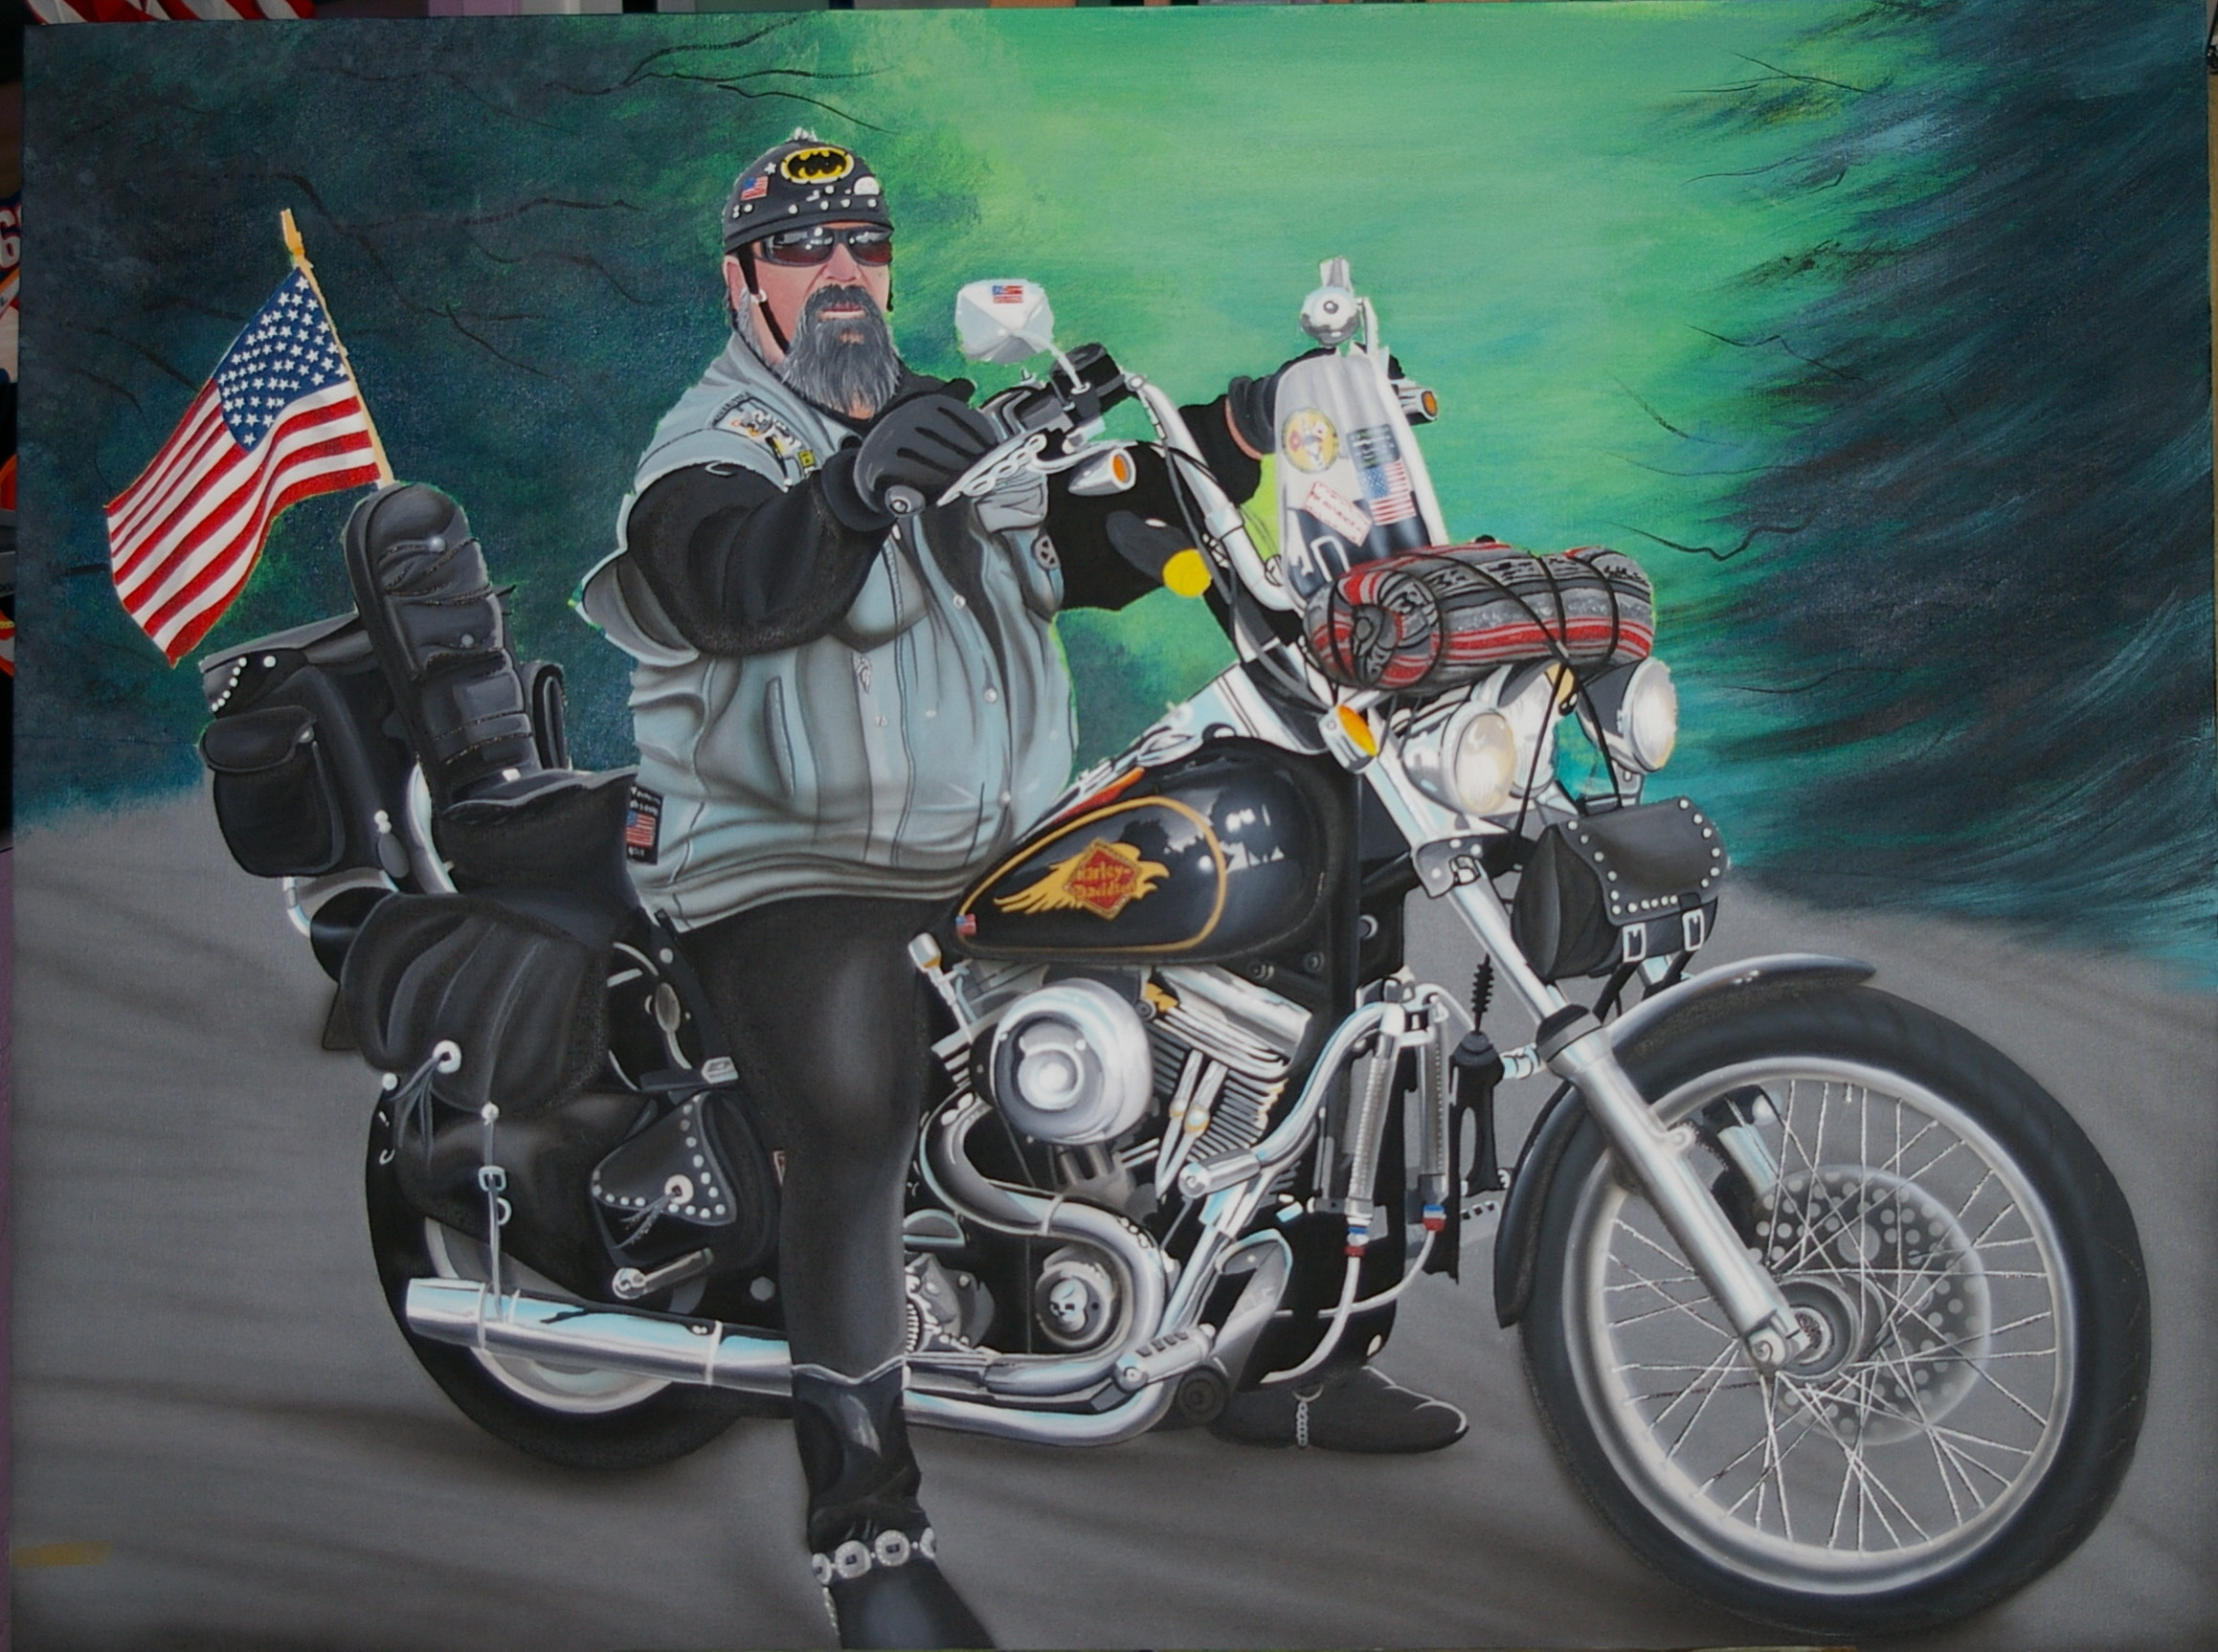 Res: 2317x1726, David Mann Motorcycle Art Wallpaper